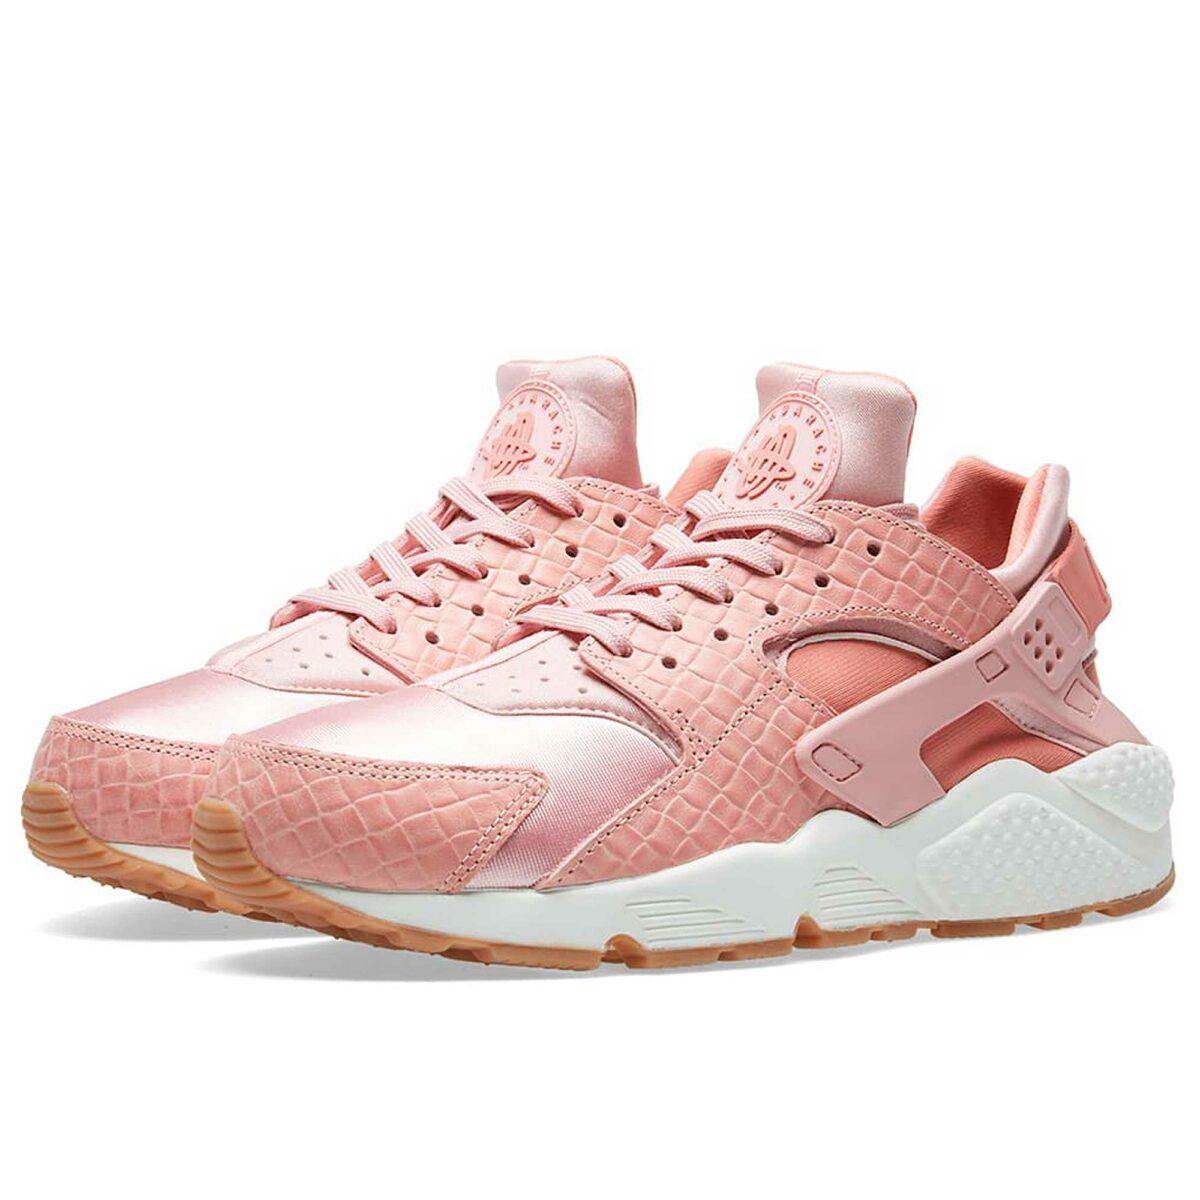 nike air huarache pink glaze 683818_601 купить